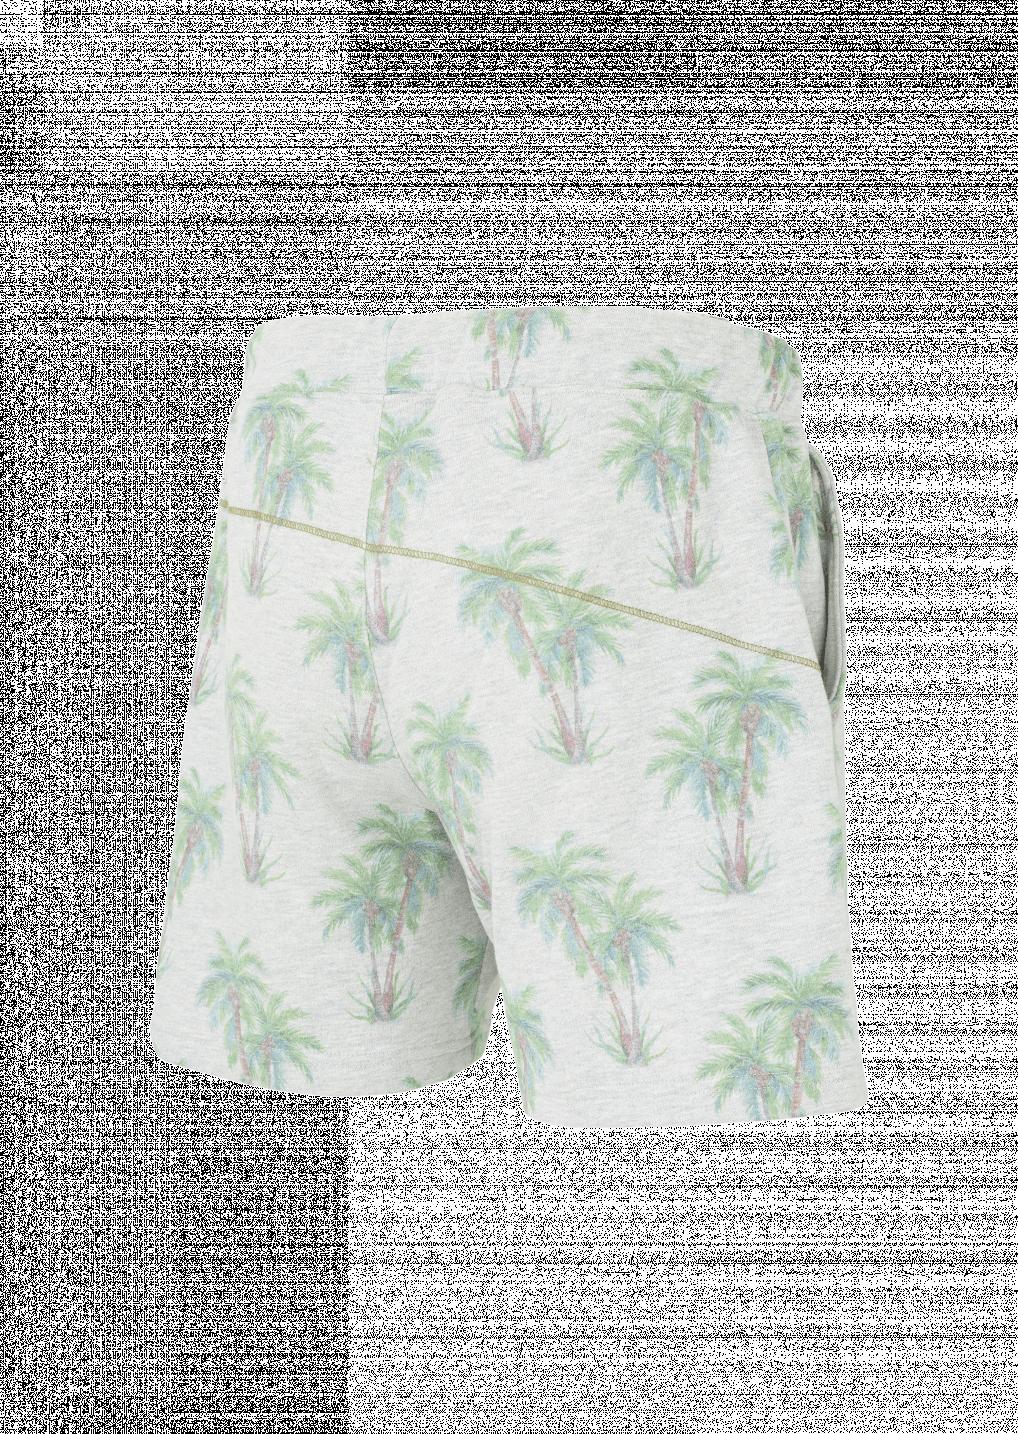 Palmtree Short Organic Picture Lawaki Print UVpzqGSM